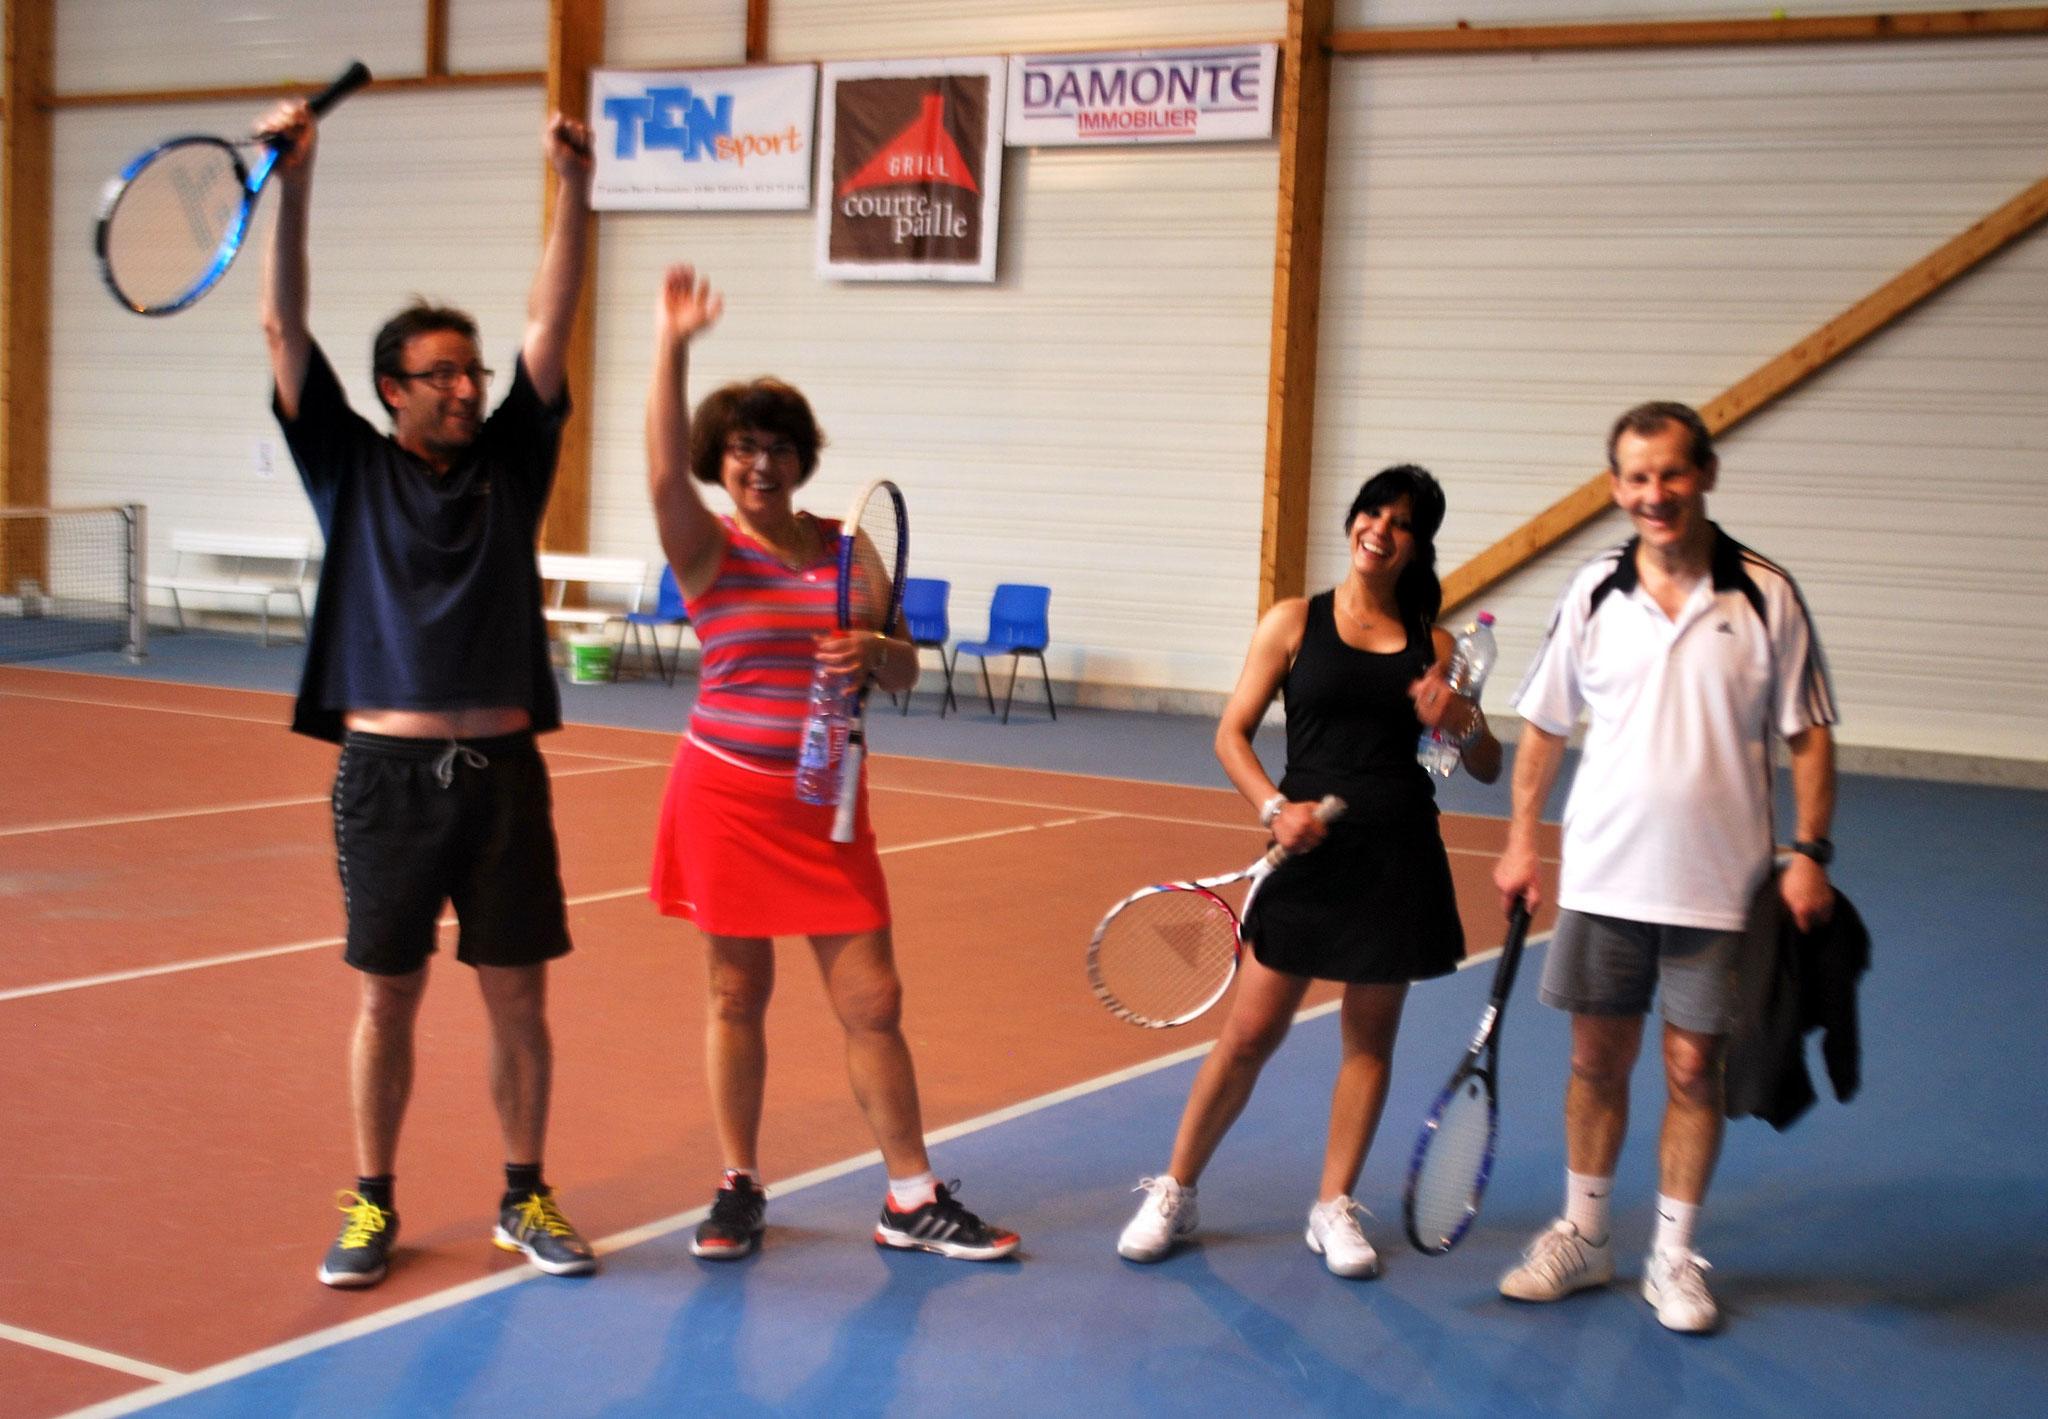 Yann, Françoise, Amal et Serge